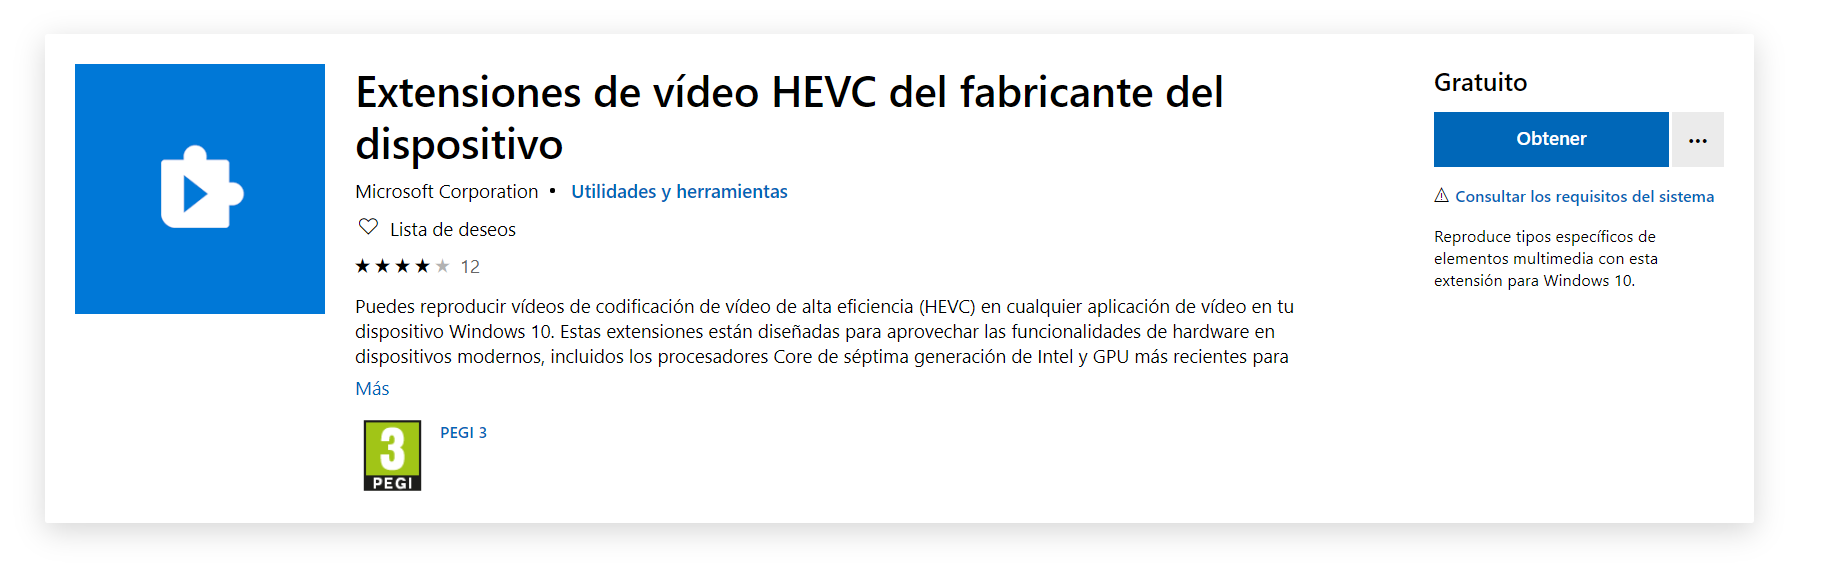 HEVC - AV1 vs HEVC